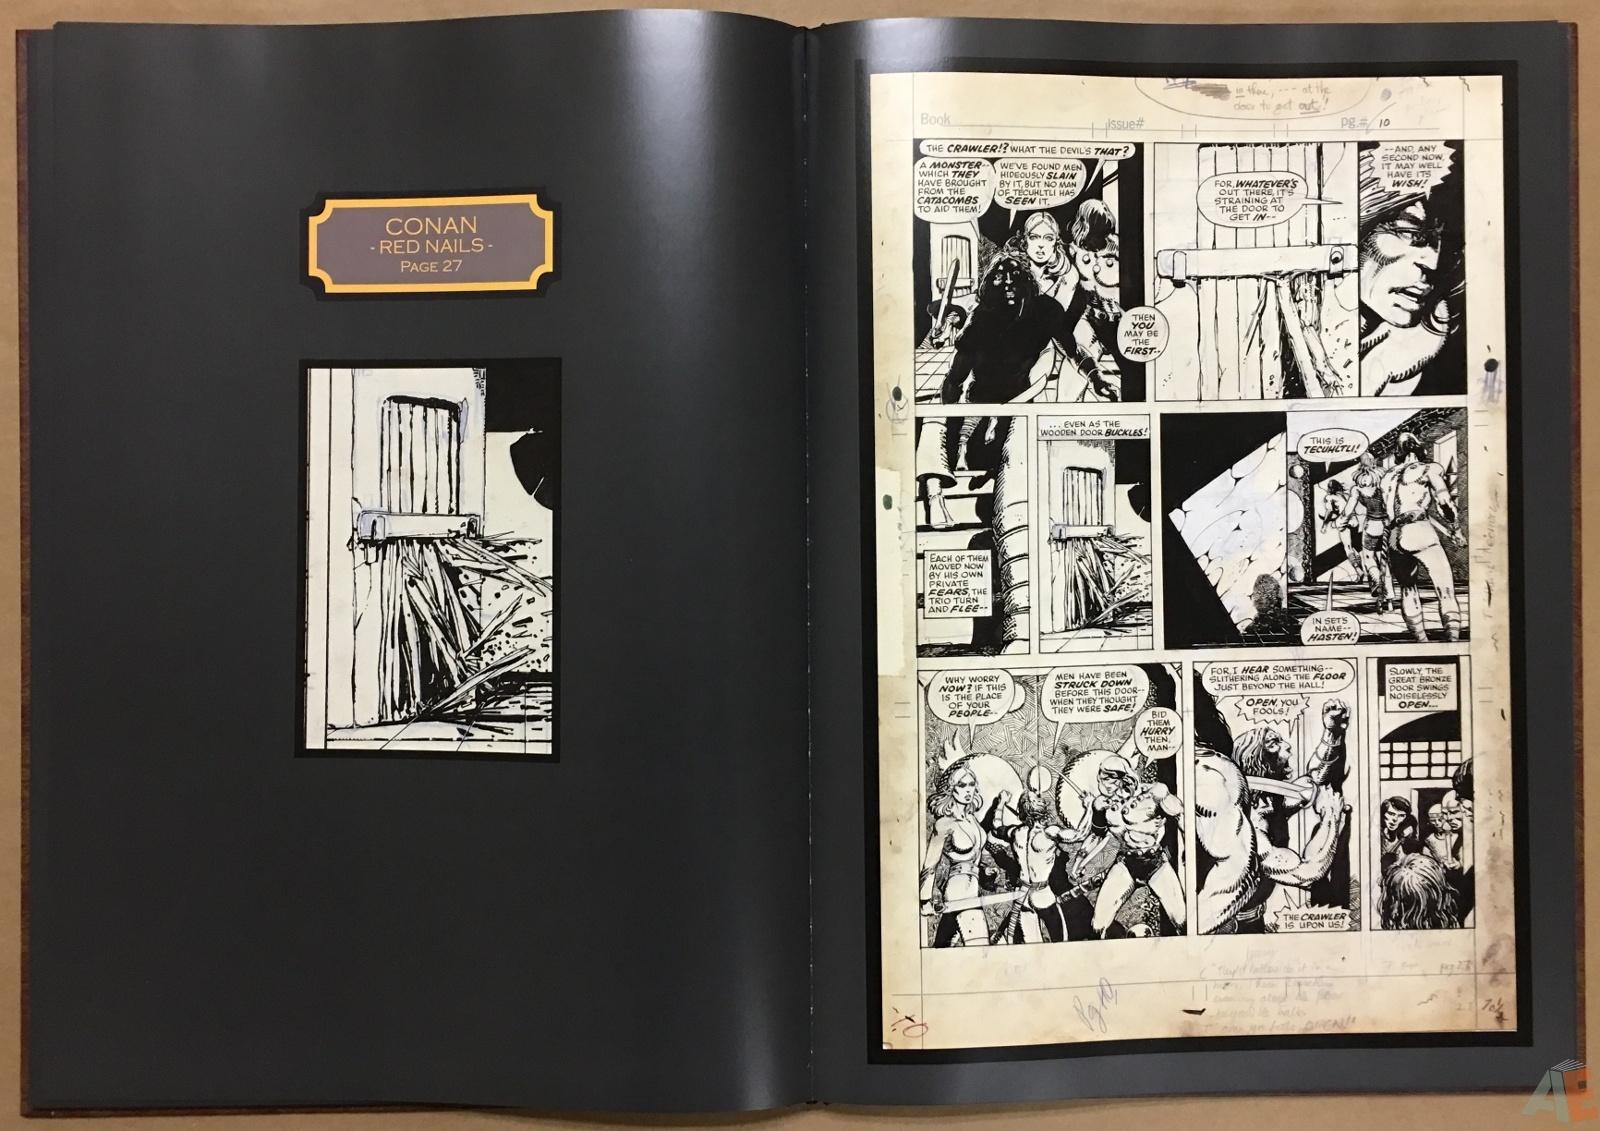 Conan: Red Nails Original Art Archives Volume 1 22